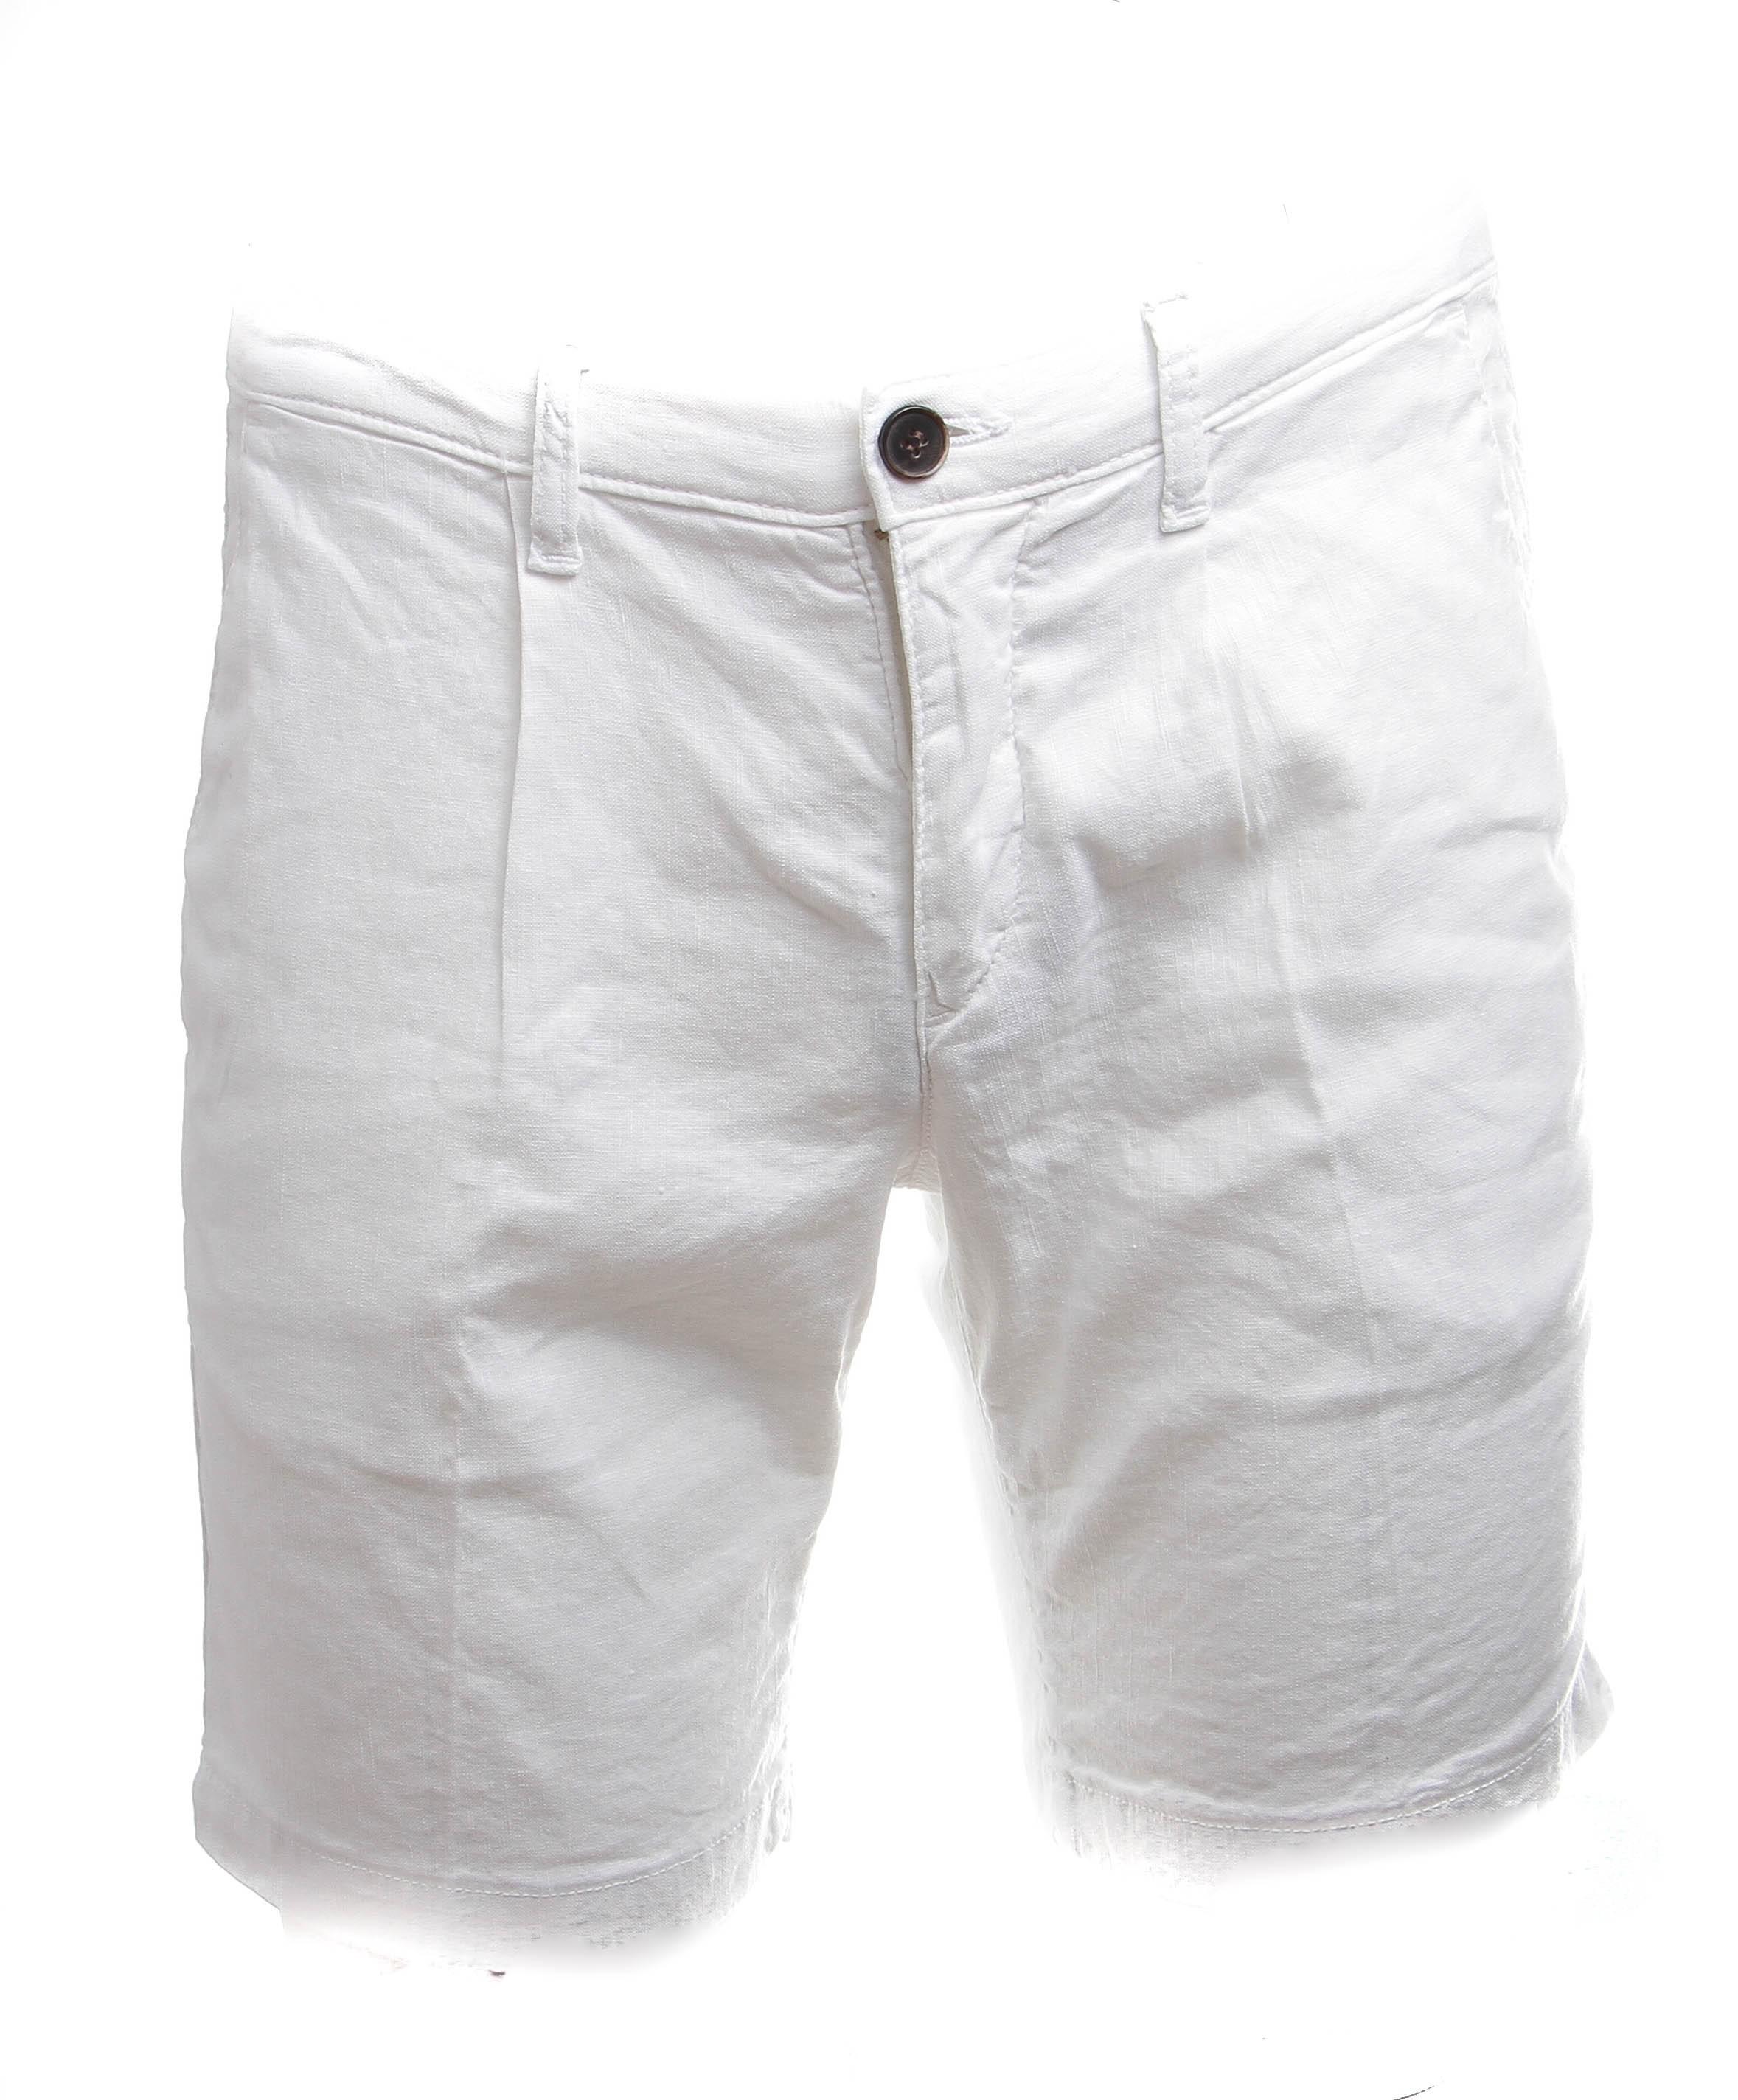 Short Blanc - Toile Summer (Bermudas)